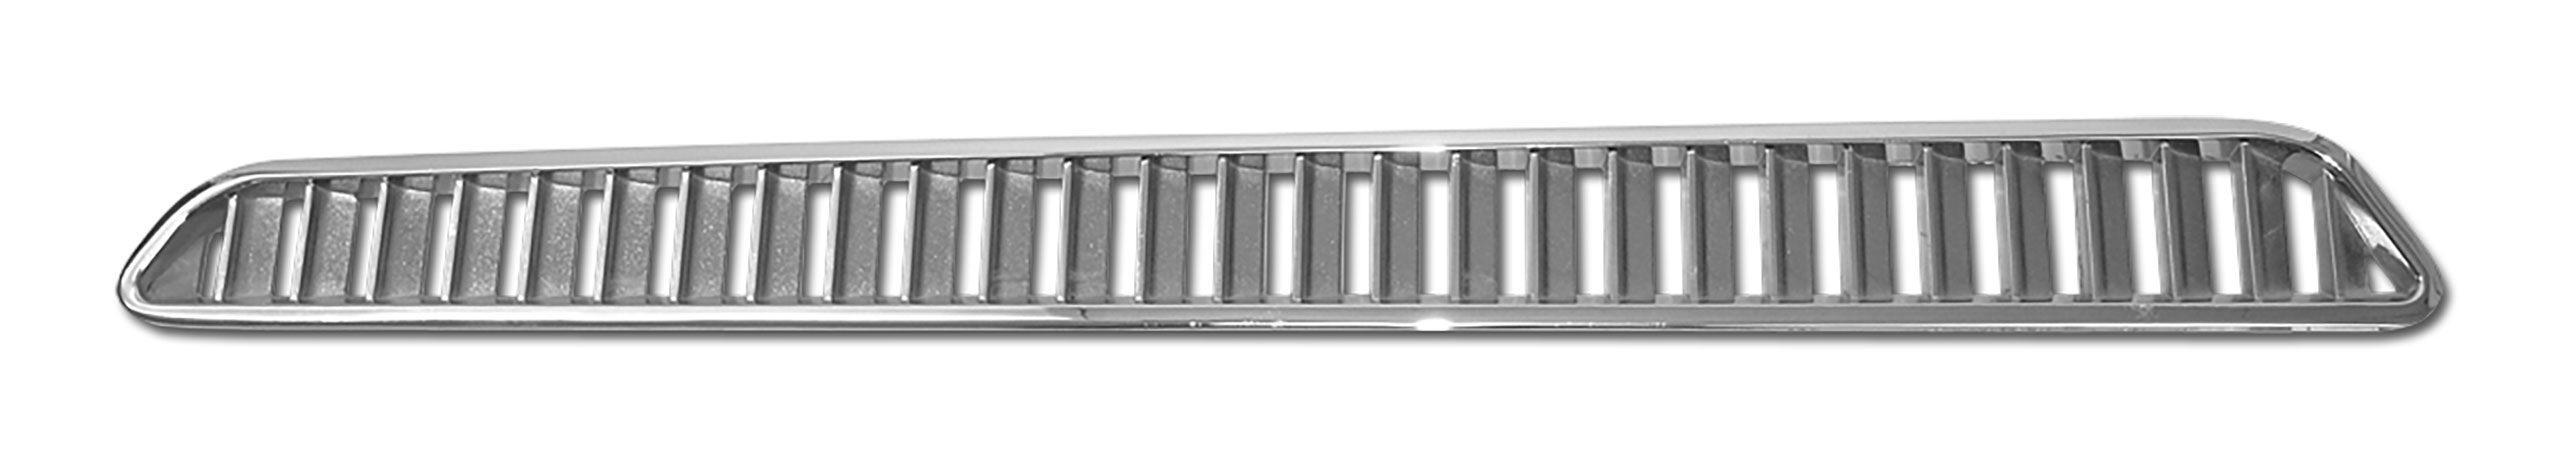 Auto Accessories of America 1965-1966 Chevrolet Corvette Hood Grille. 396/427 RH